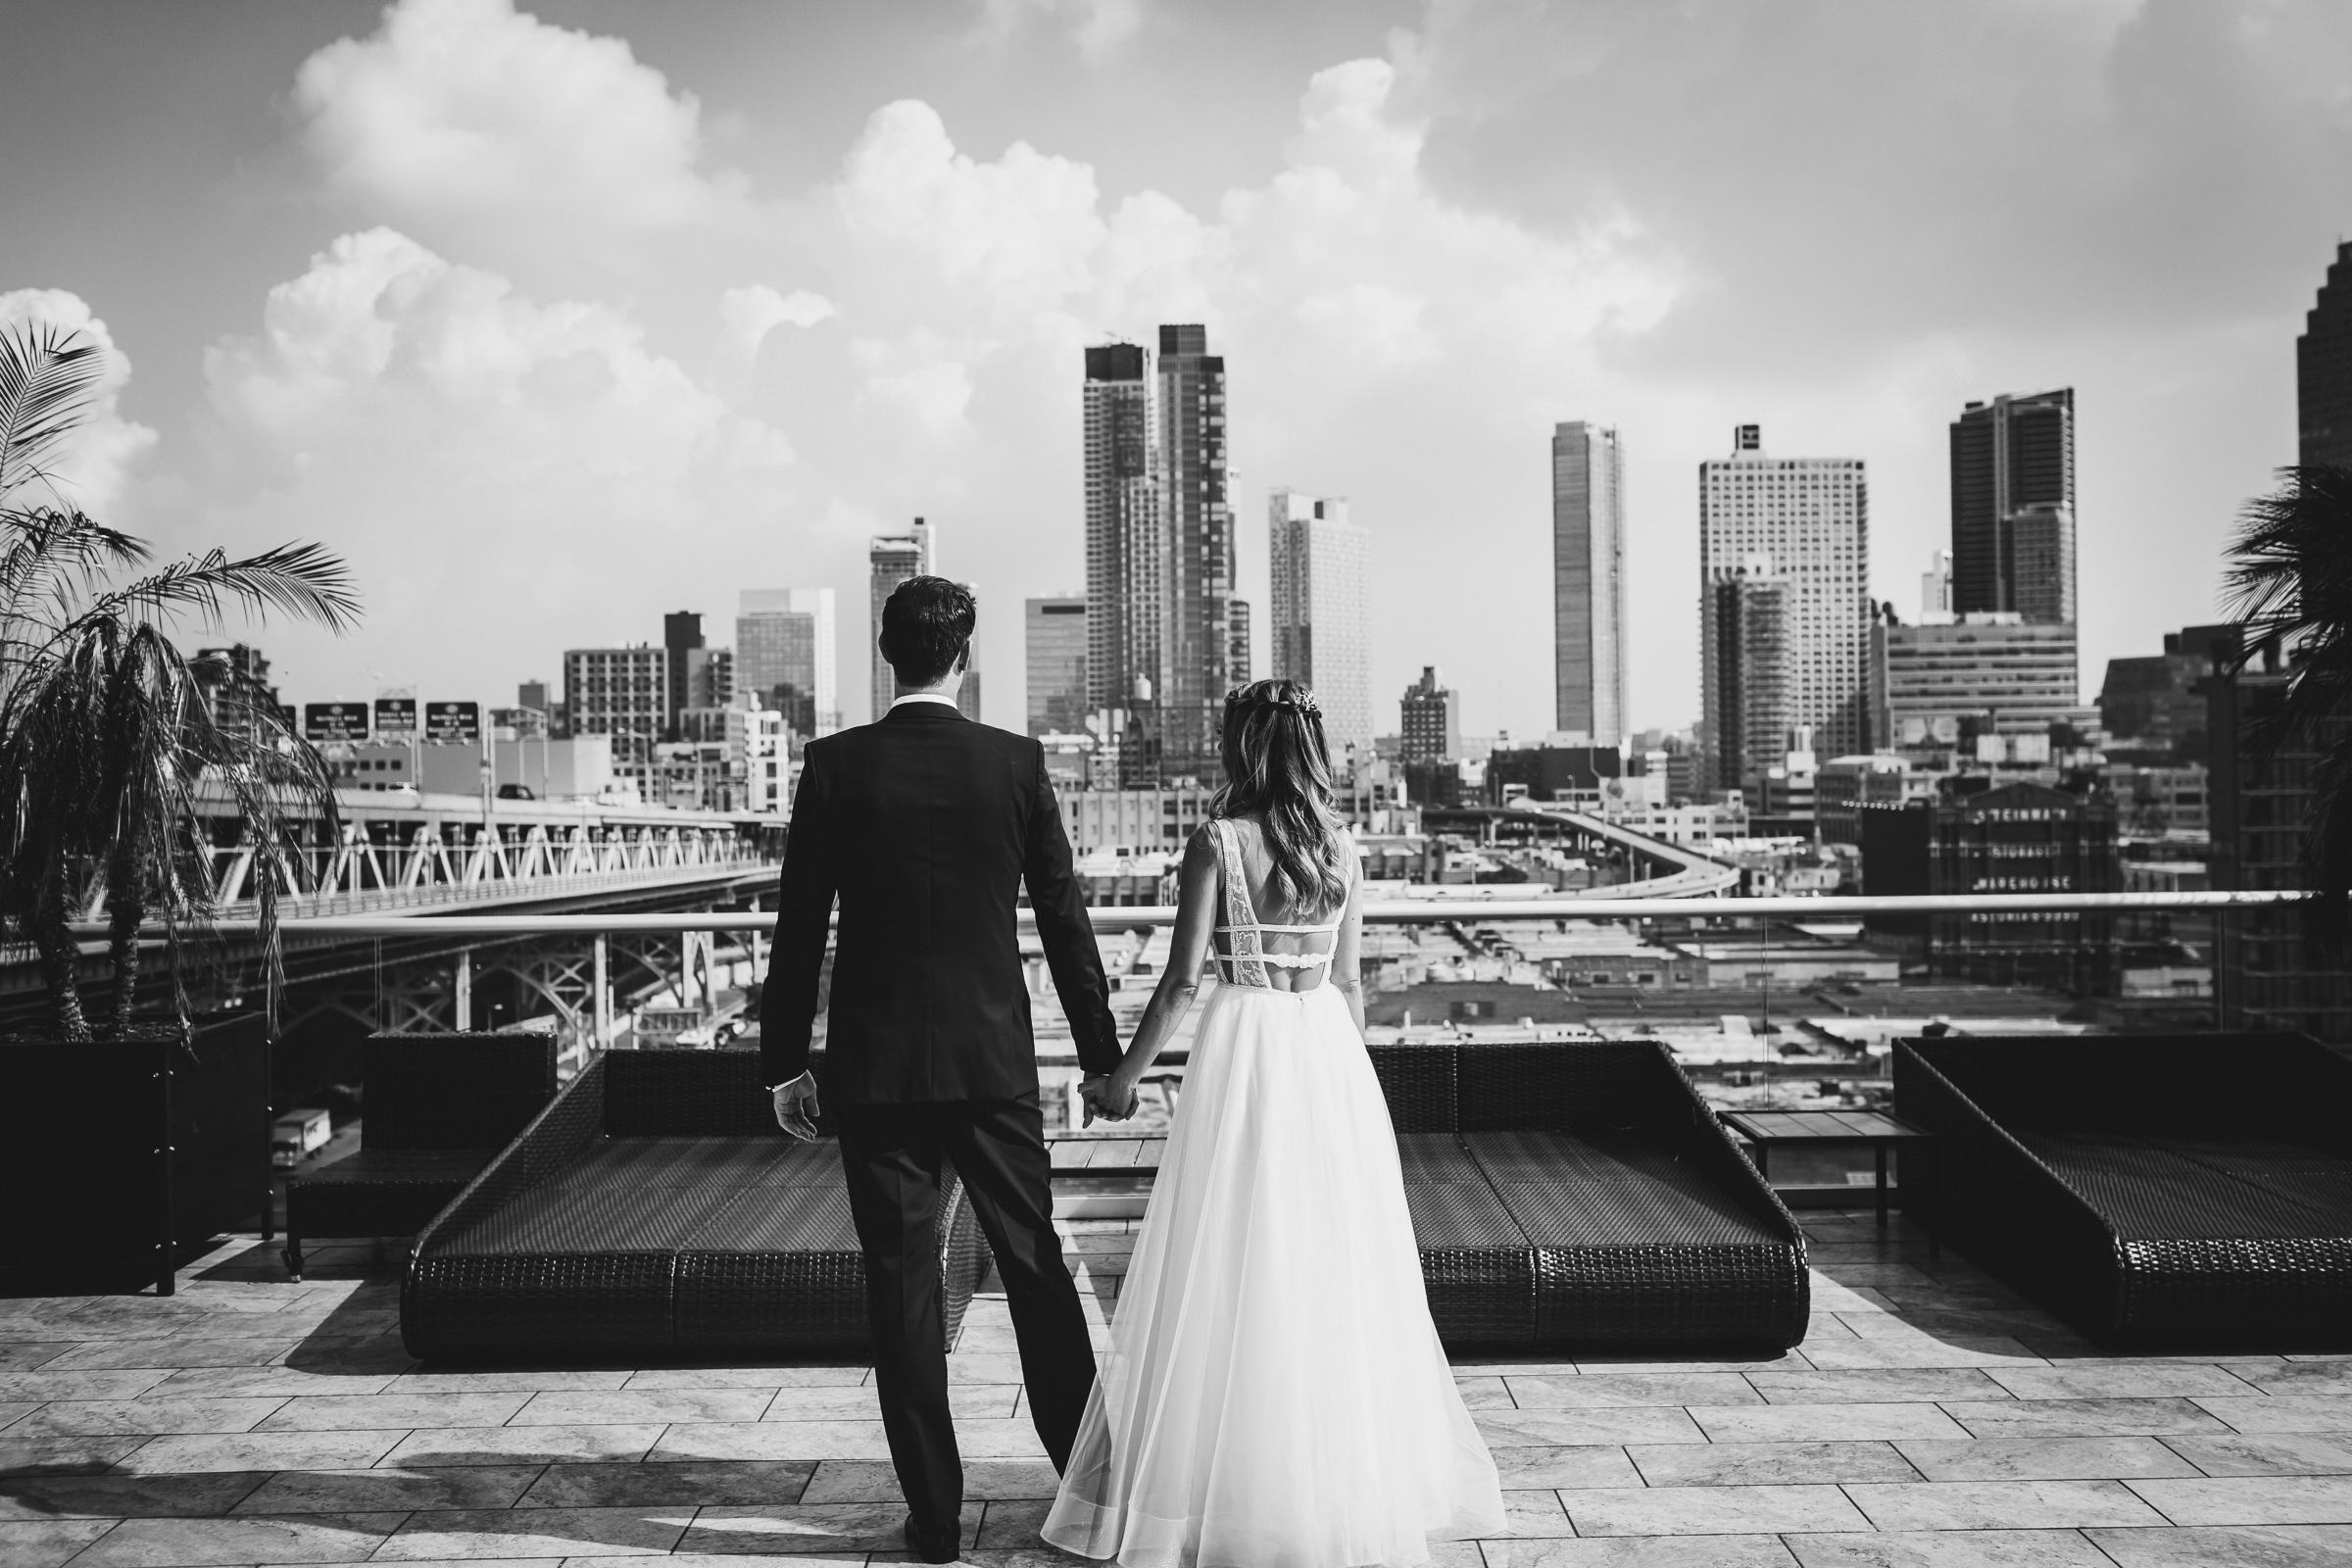 Ravel-Hotel-Penthouse-808-Long-Island-City-New-York-Documentary-Wedding-Photographer-22.jpg